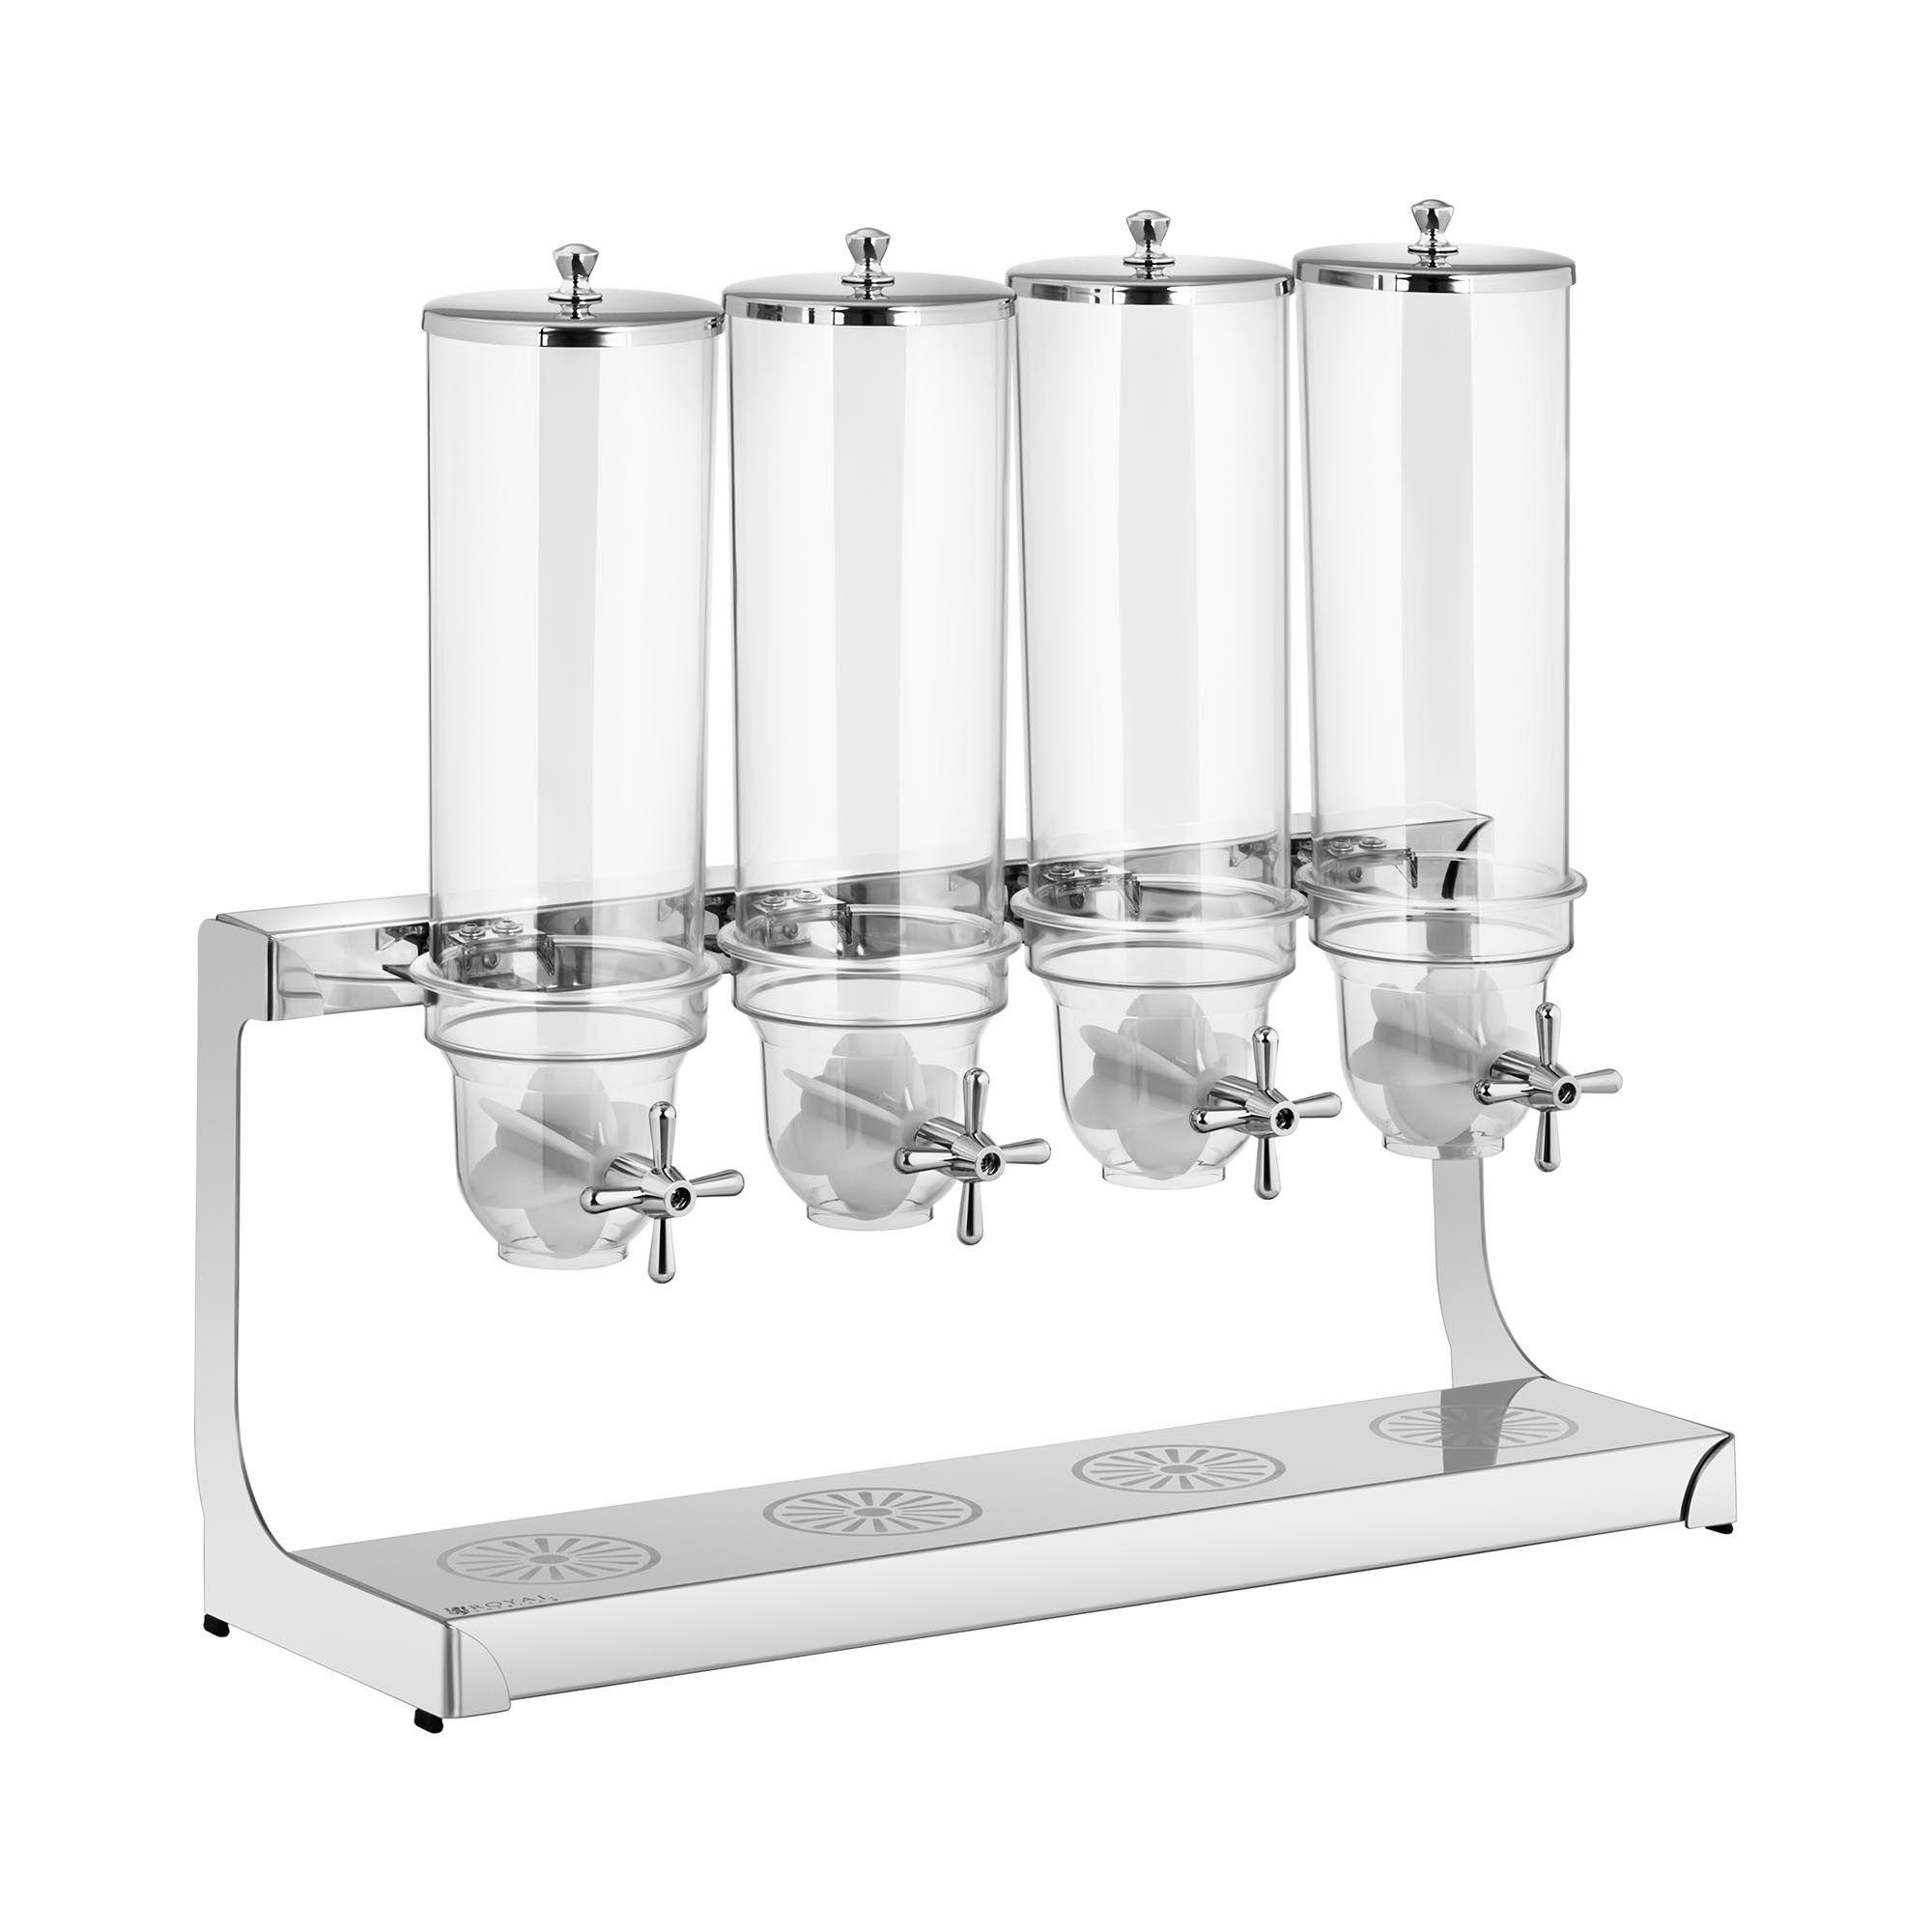 Royal Catering Frokostblanding-dispenser - 4 x 3.5 L - 4 beholdere